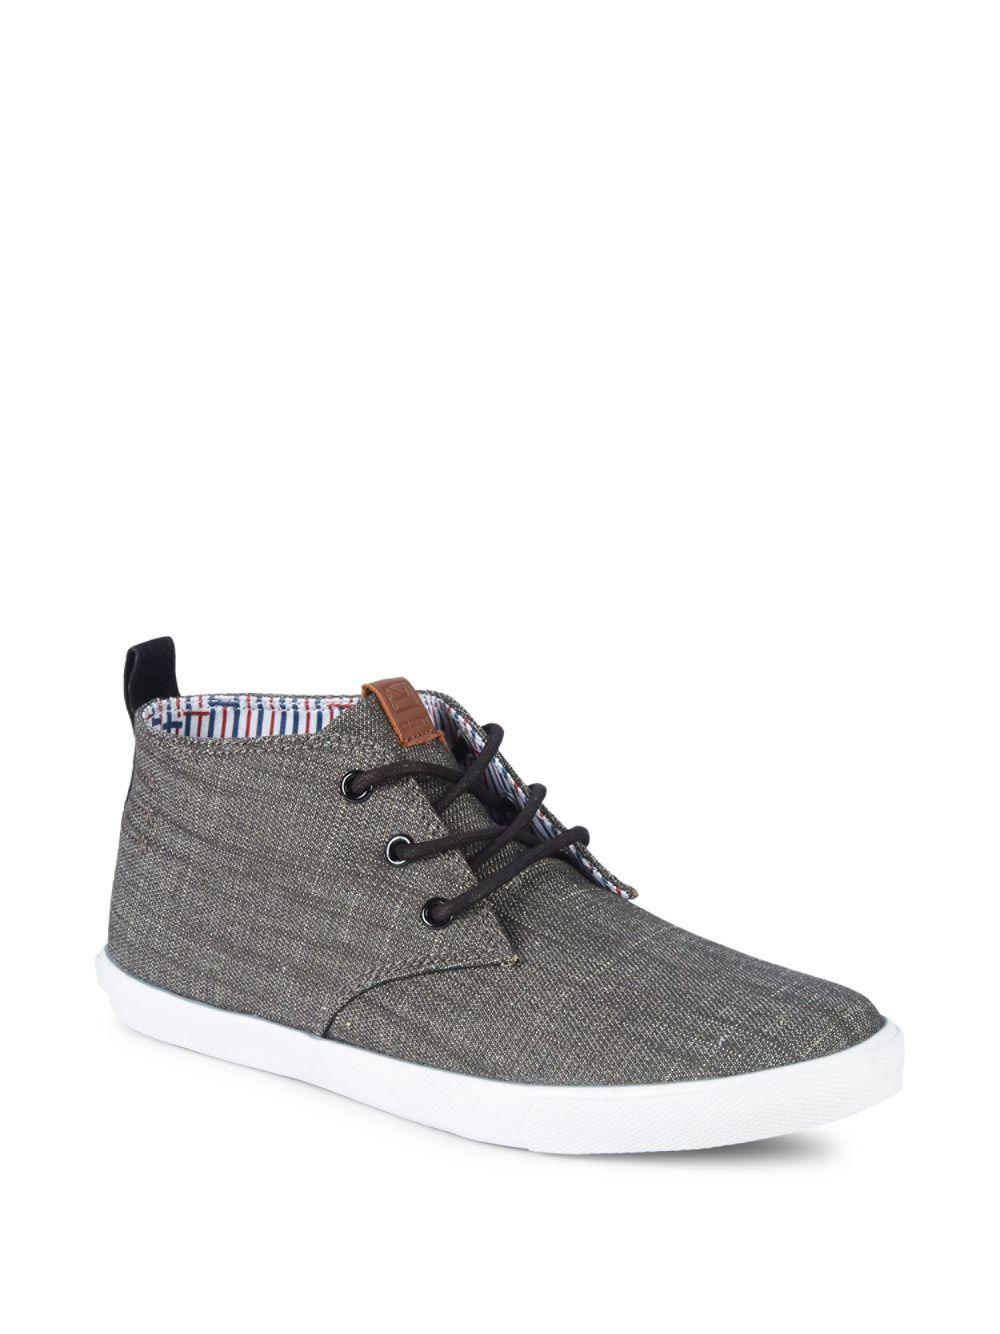 b271058b043b Lyst - Ben Sherman Chukka Style Sneakers in Black for Men